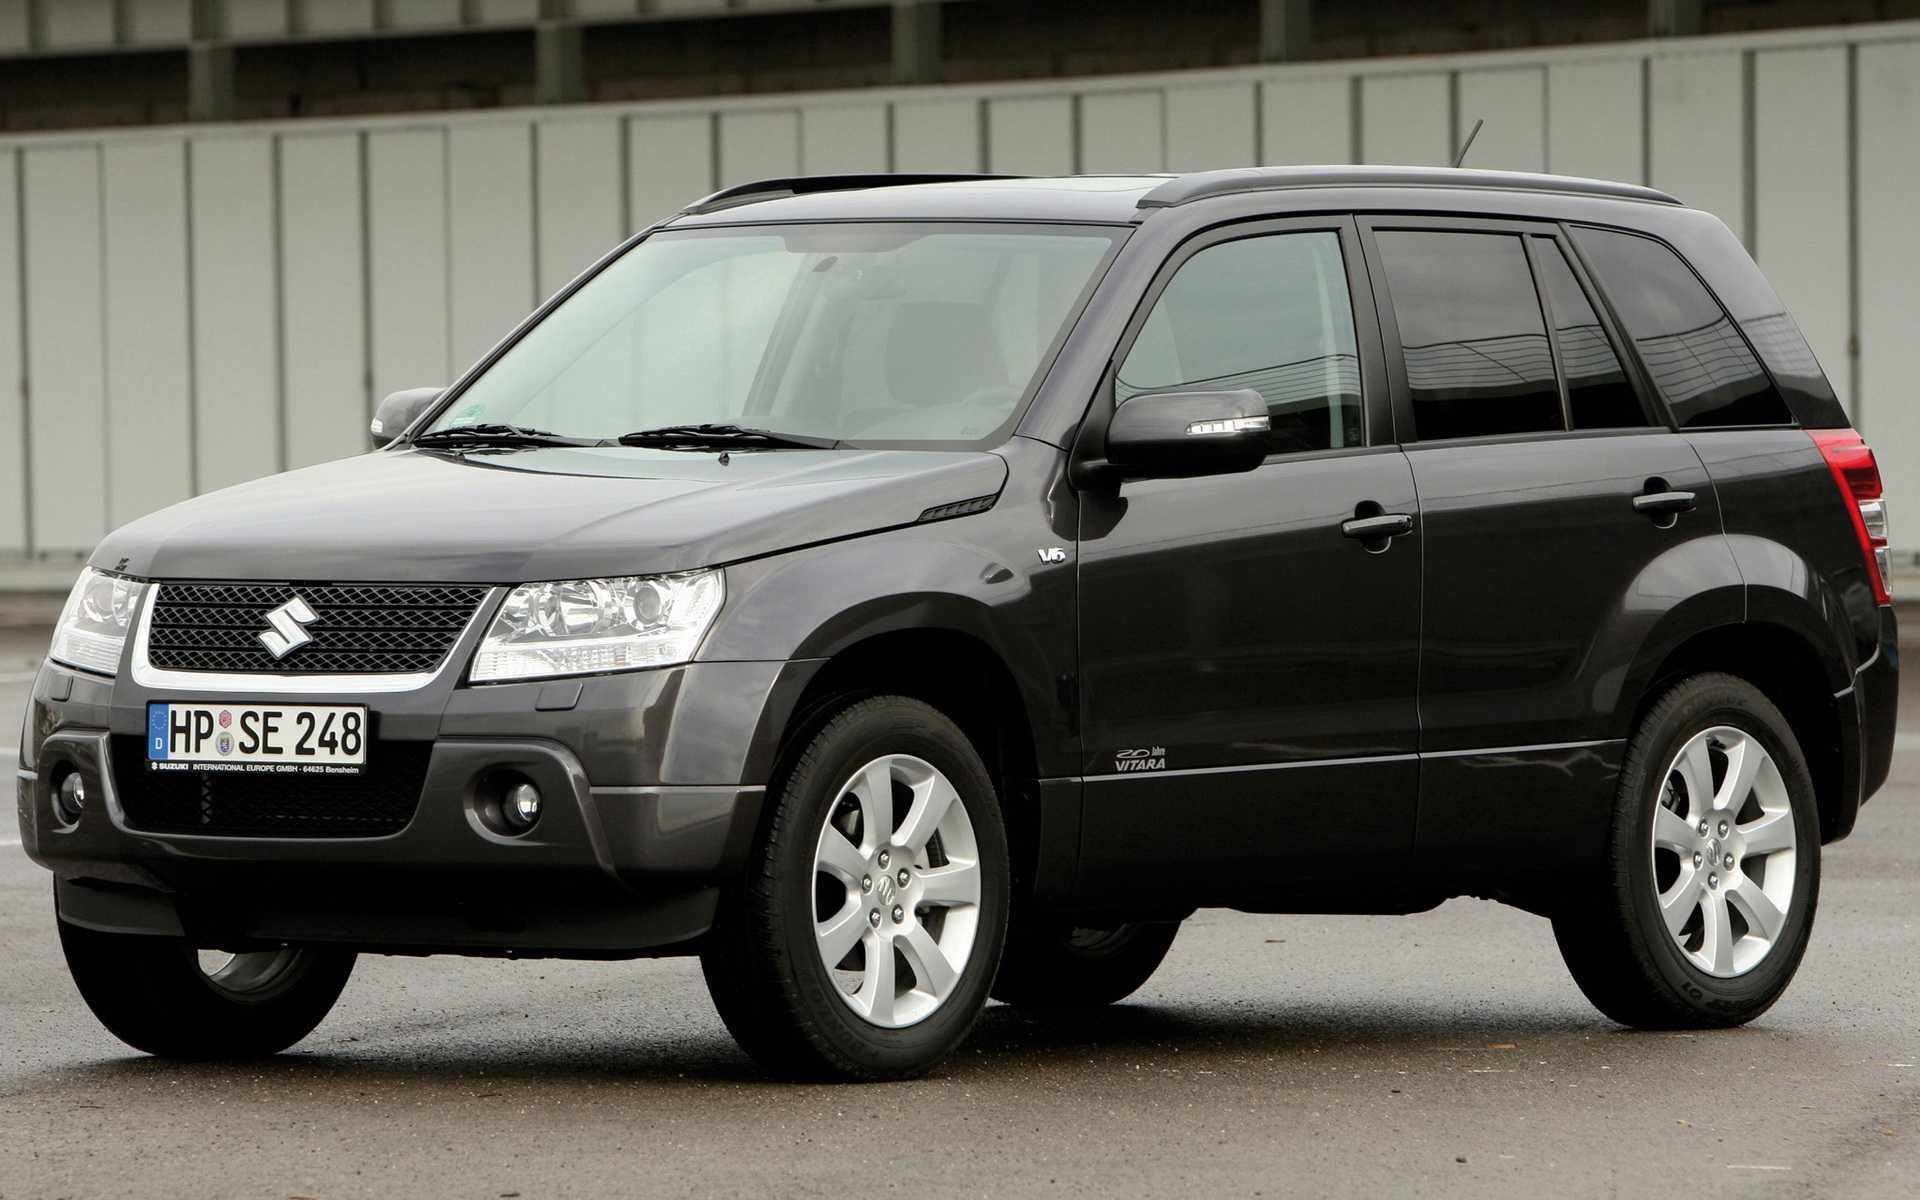 Технические характеристики suzuki grand vitara - двигатели, расход топлива, размеры кузова